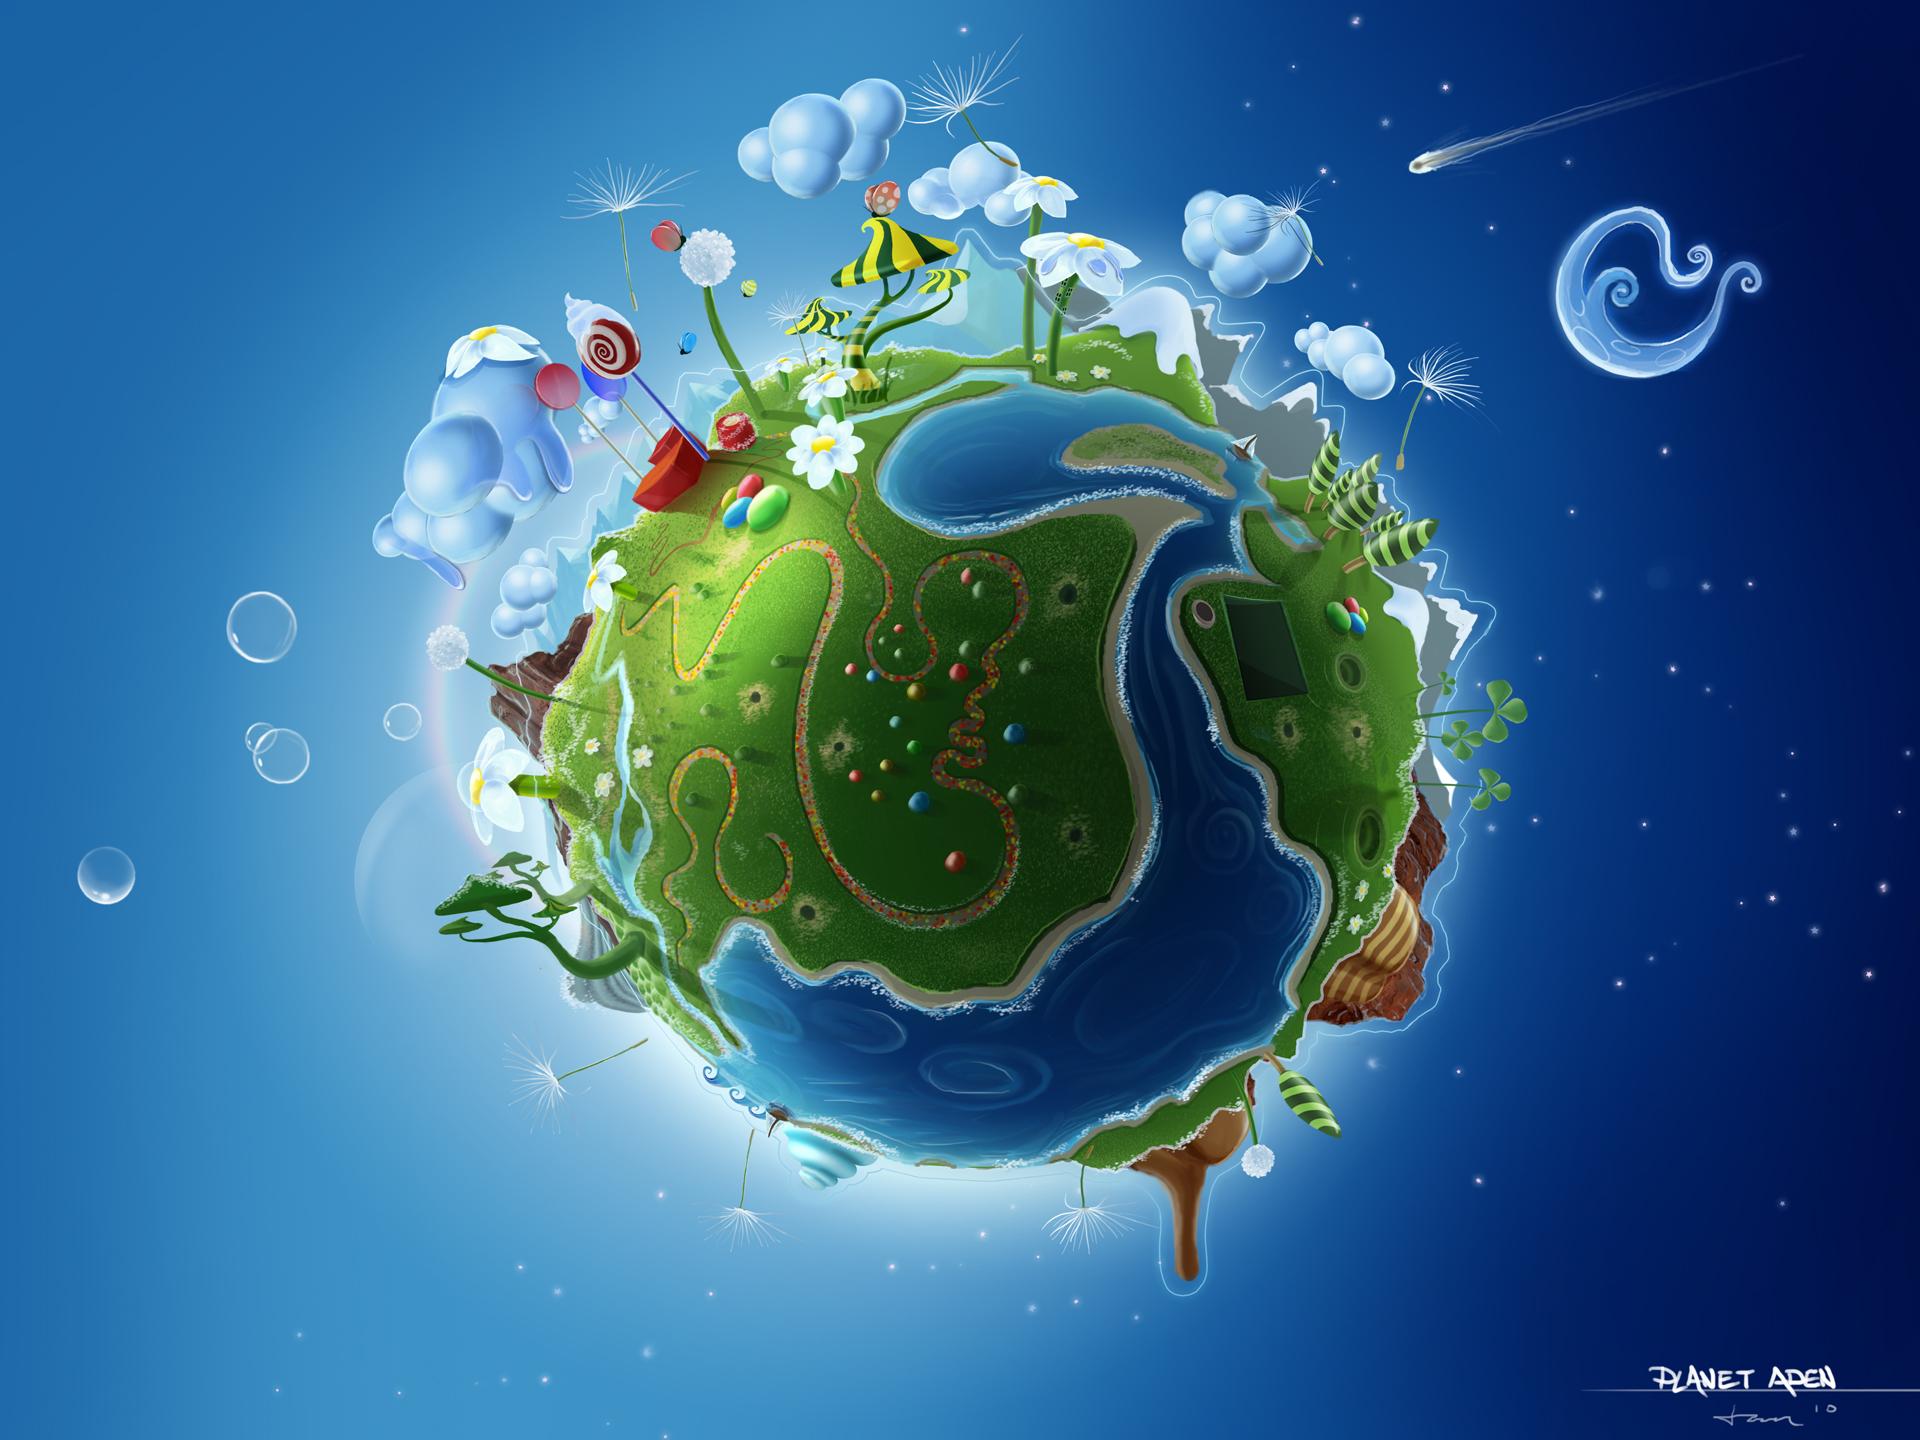 Planet Aden